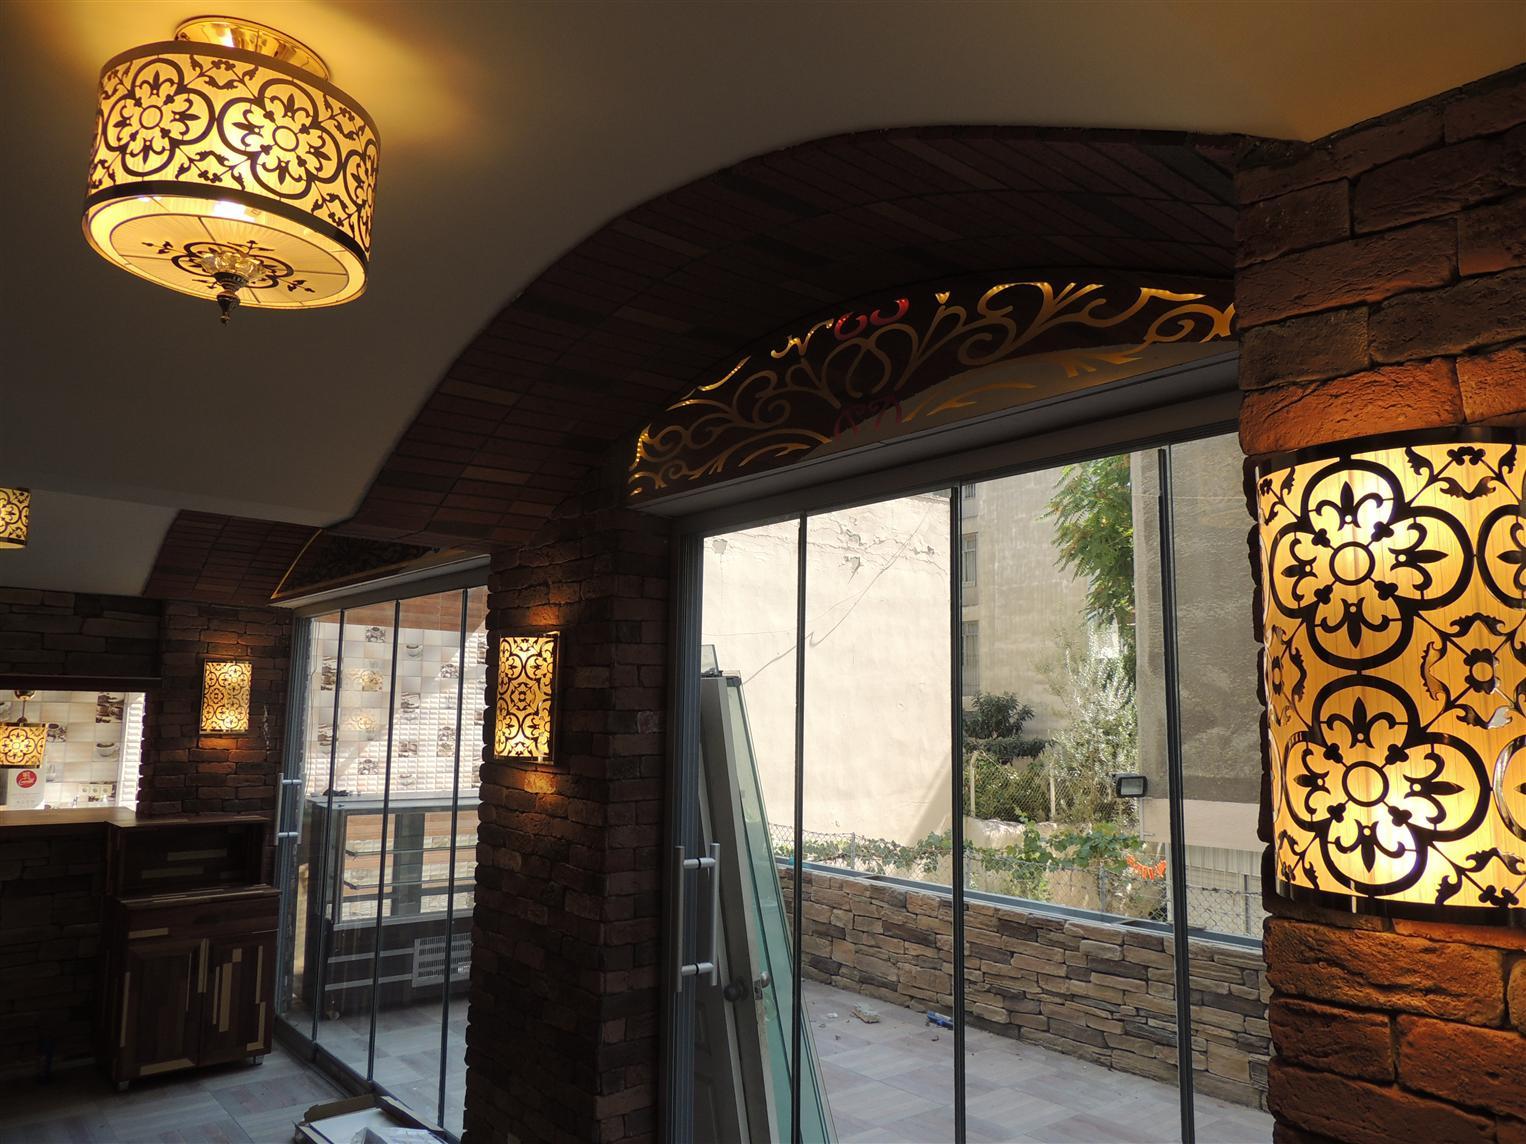 adria-cafe2015921173615525.jpg izmir vitray çalışması